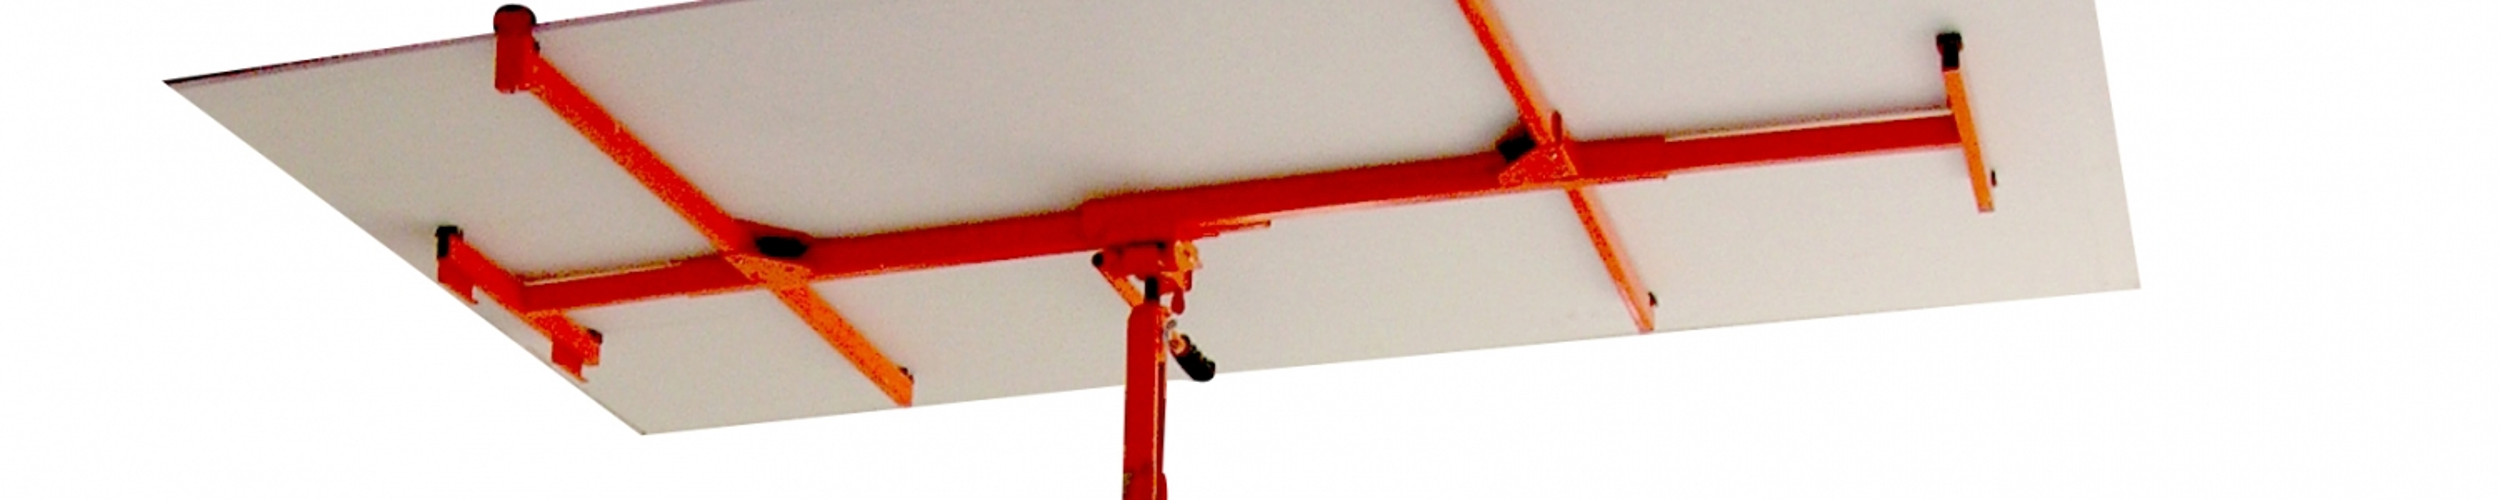 Plafondplatenlift